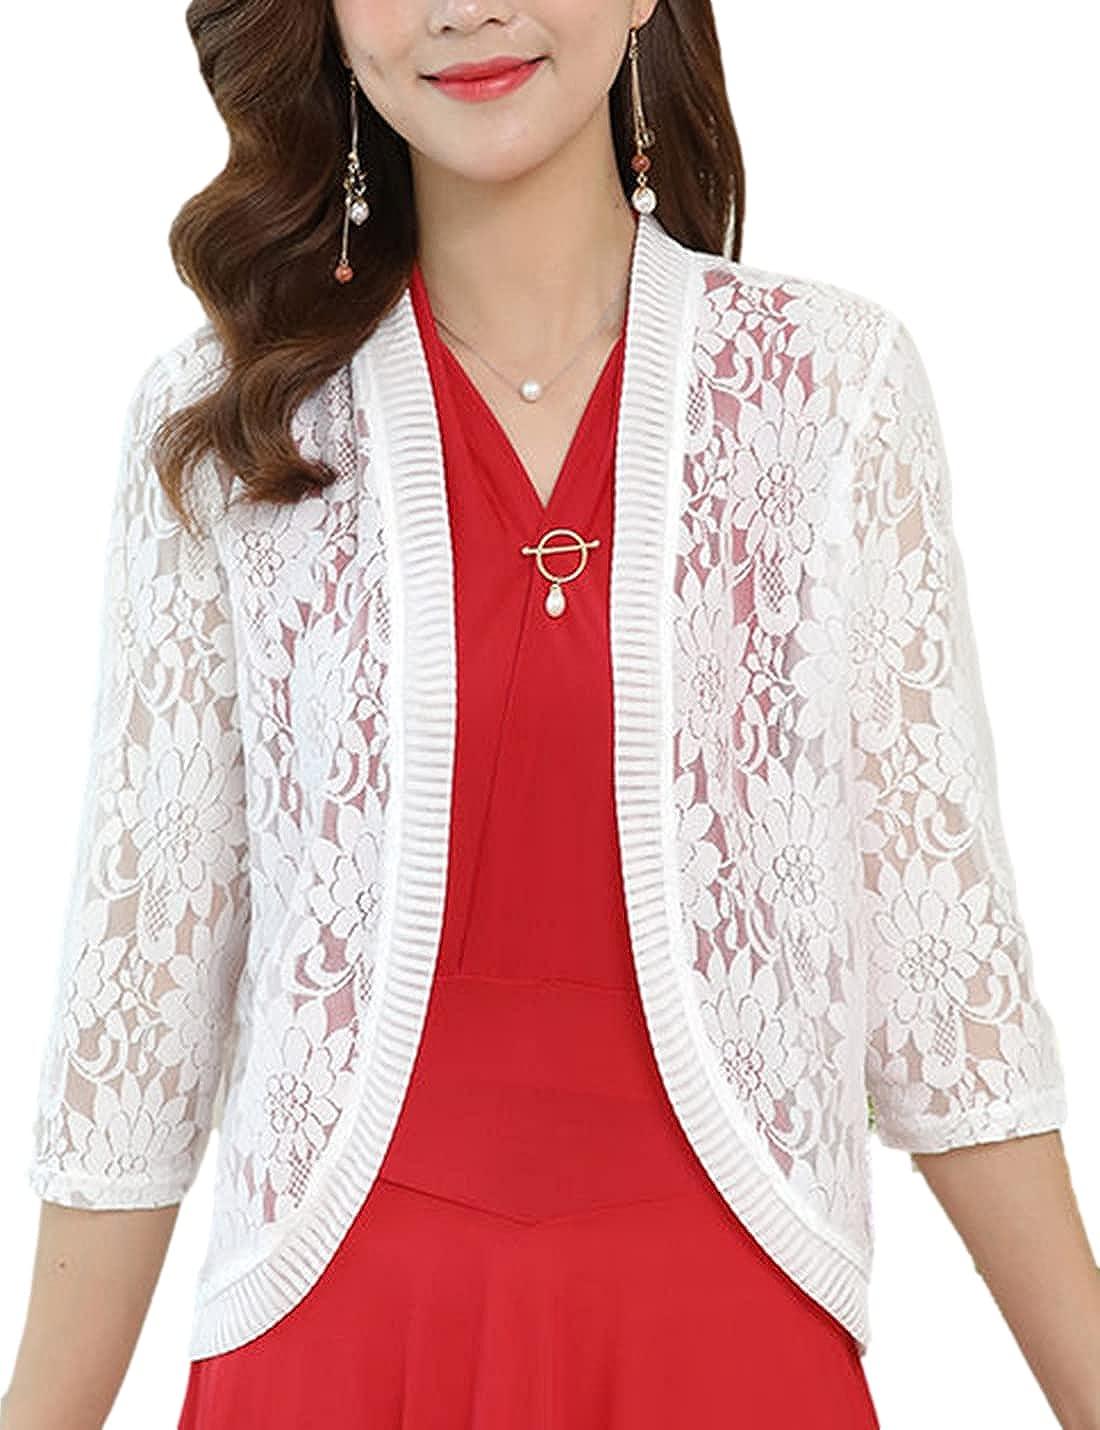 SeekMe Women's Floral Lace Open Front Bolero Cardigan 3/4 Sleeves Sheer Crop Shrugs